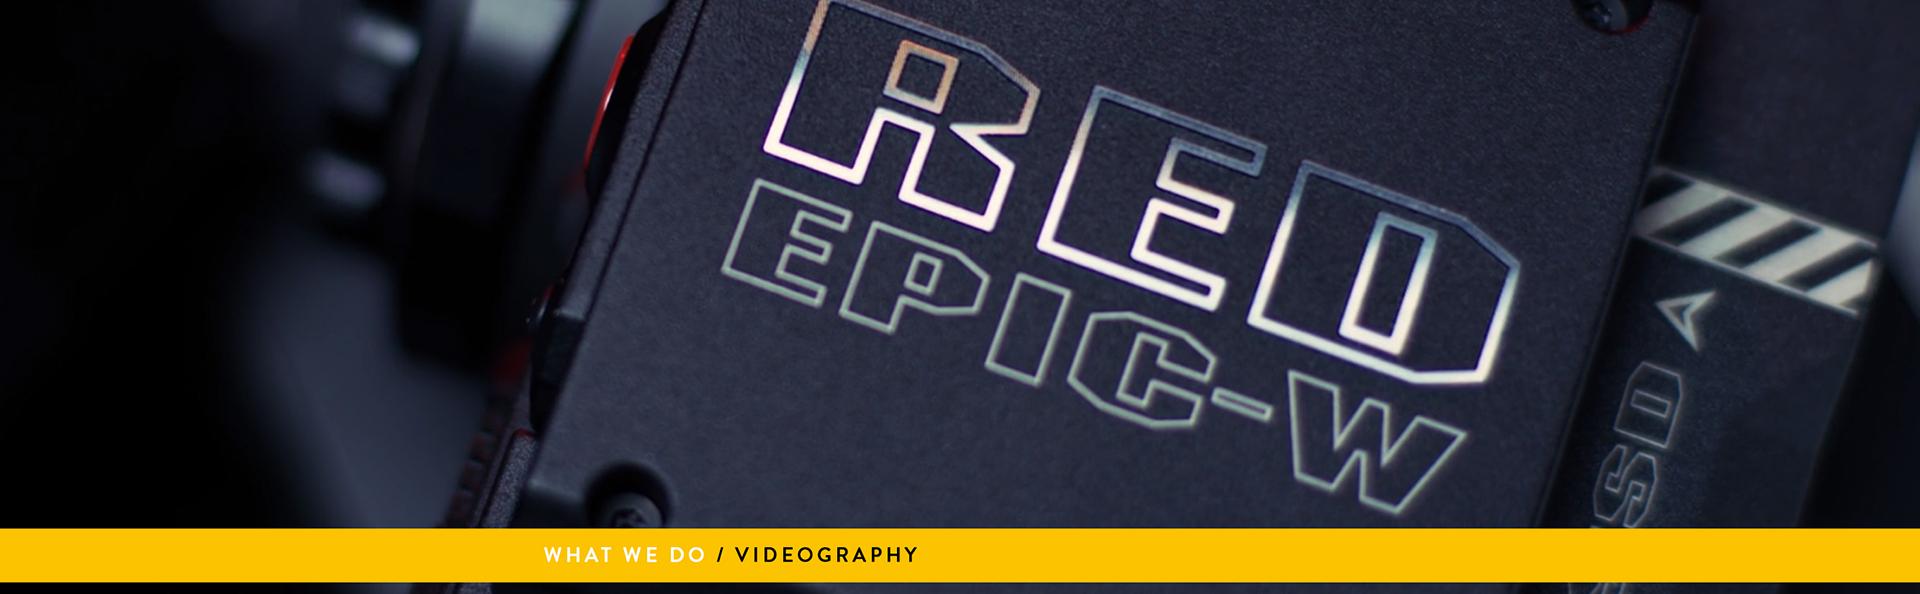 Videography_1_Web